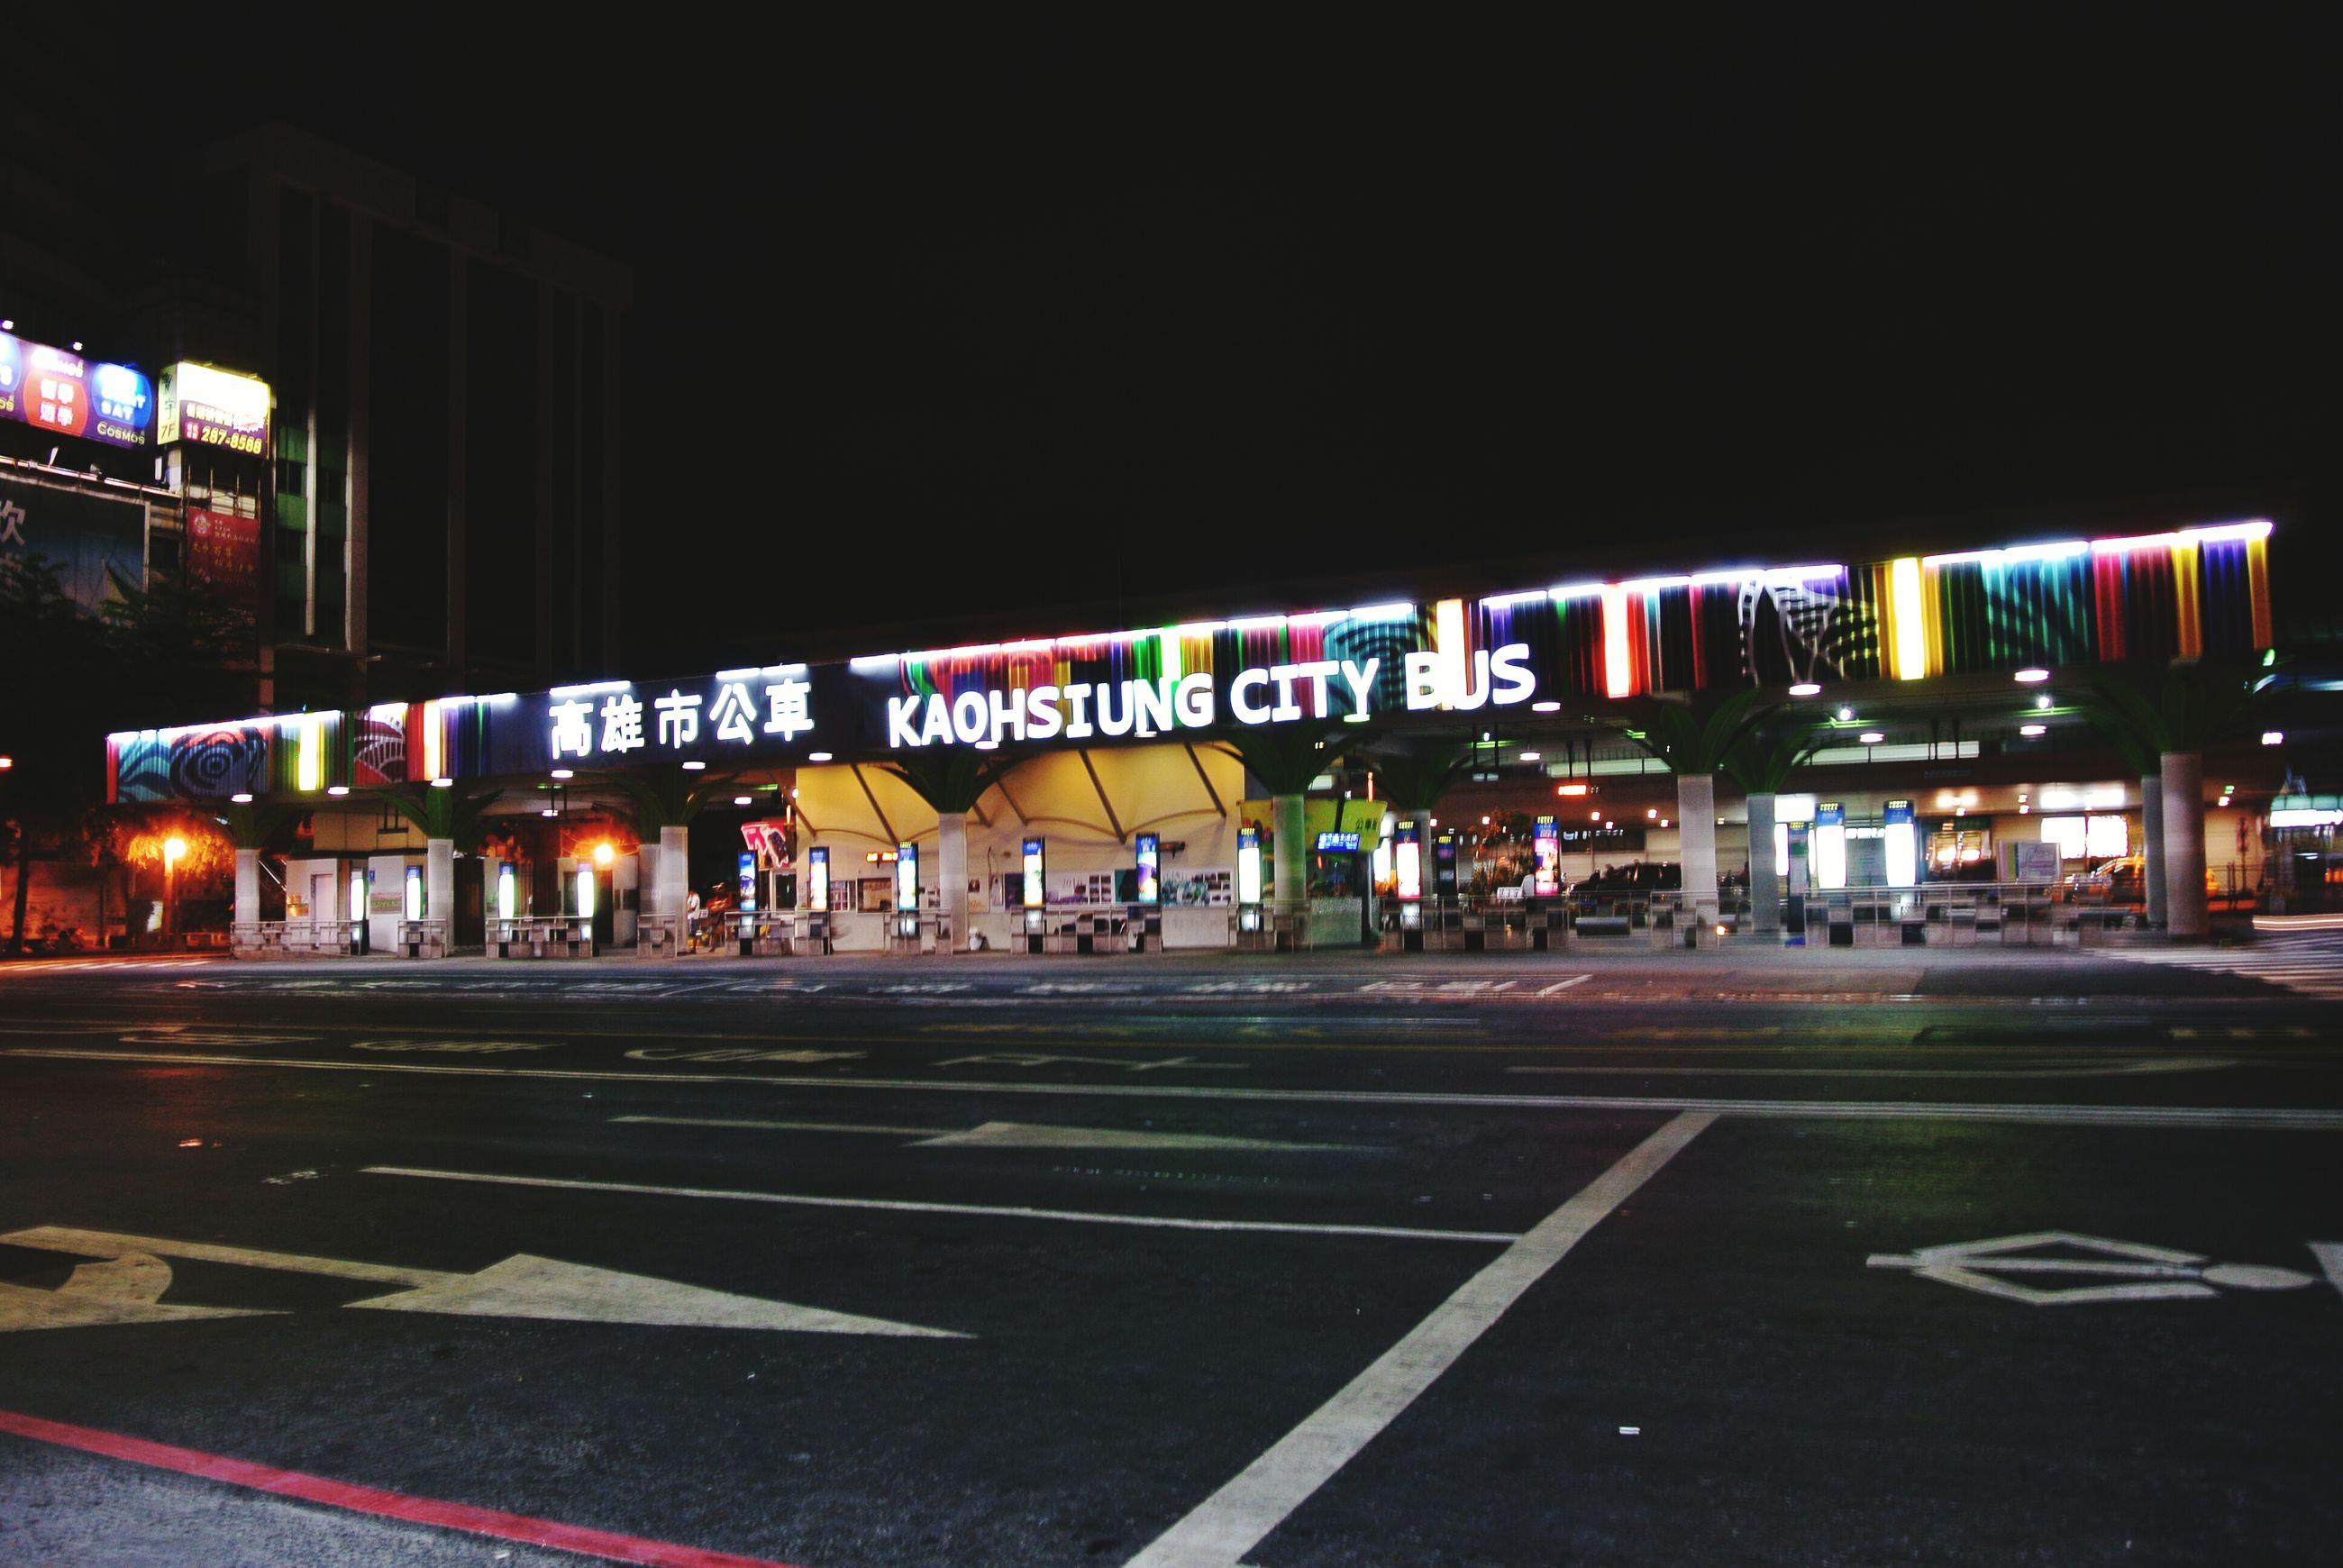 高雄 台灣 Bus 公車站 Kaohsiung Bus Station Taiwan